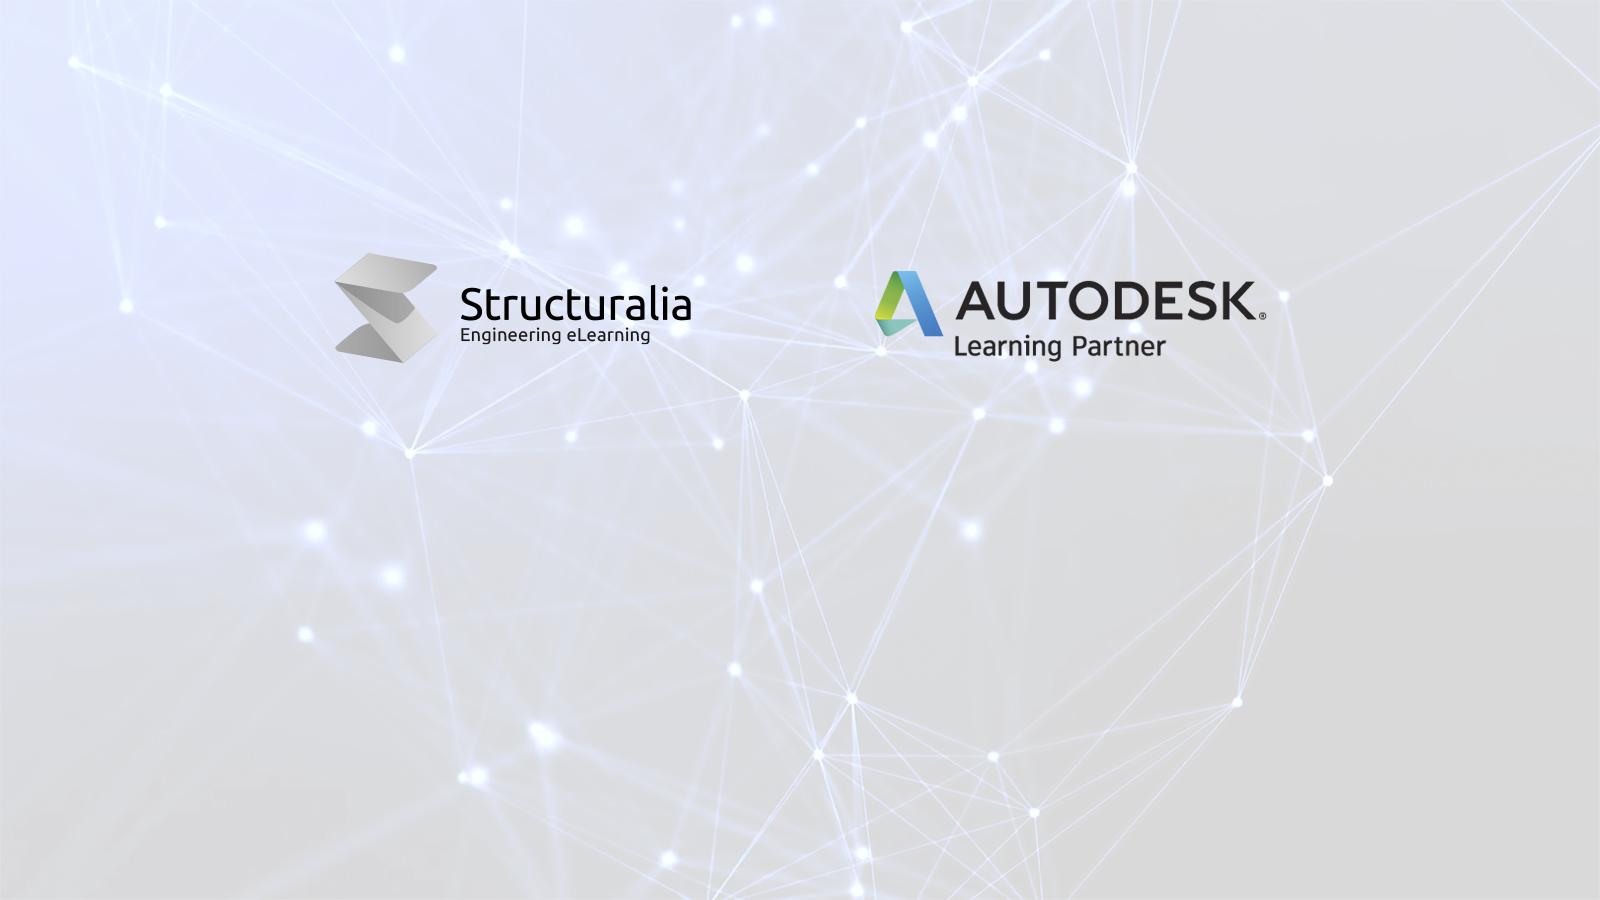 Structuralia: Centro Autorizado Autodesk (ATC)